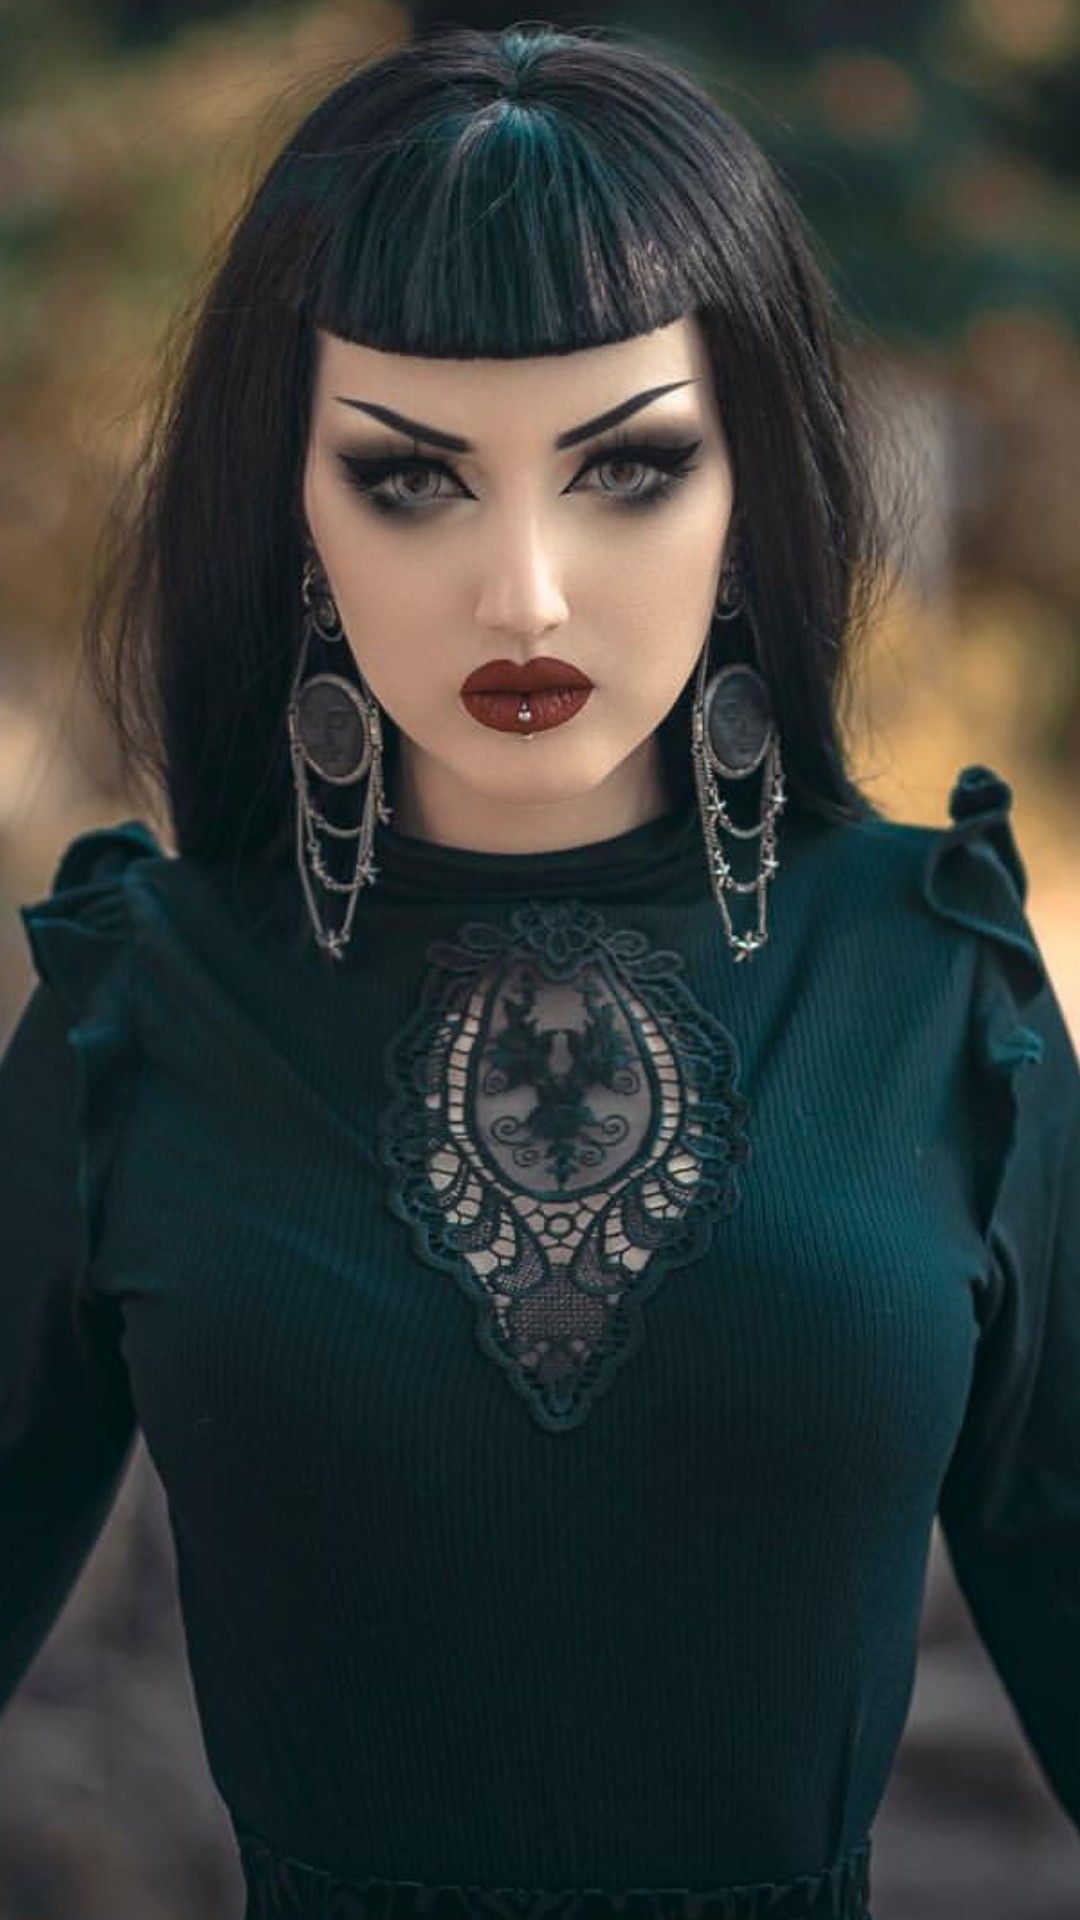 Obsidian kerttu obsidian kerttu in pinterest gothic goth